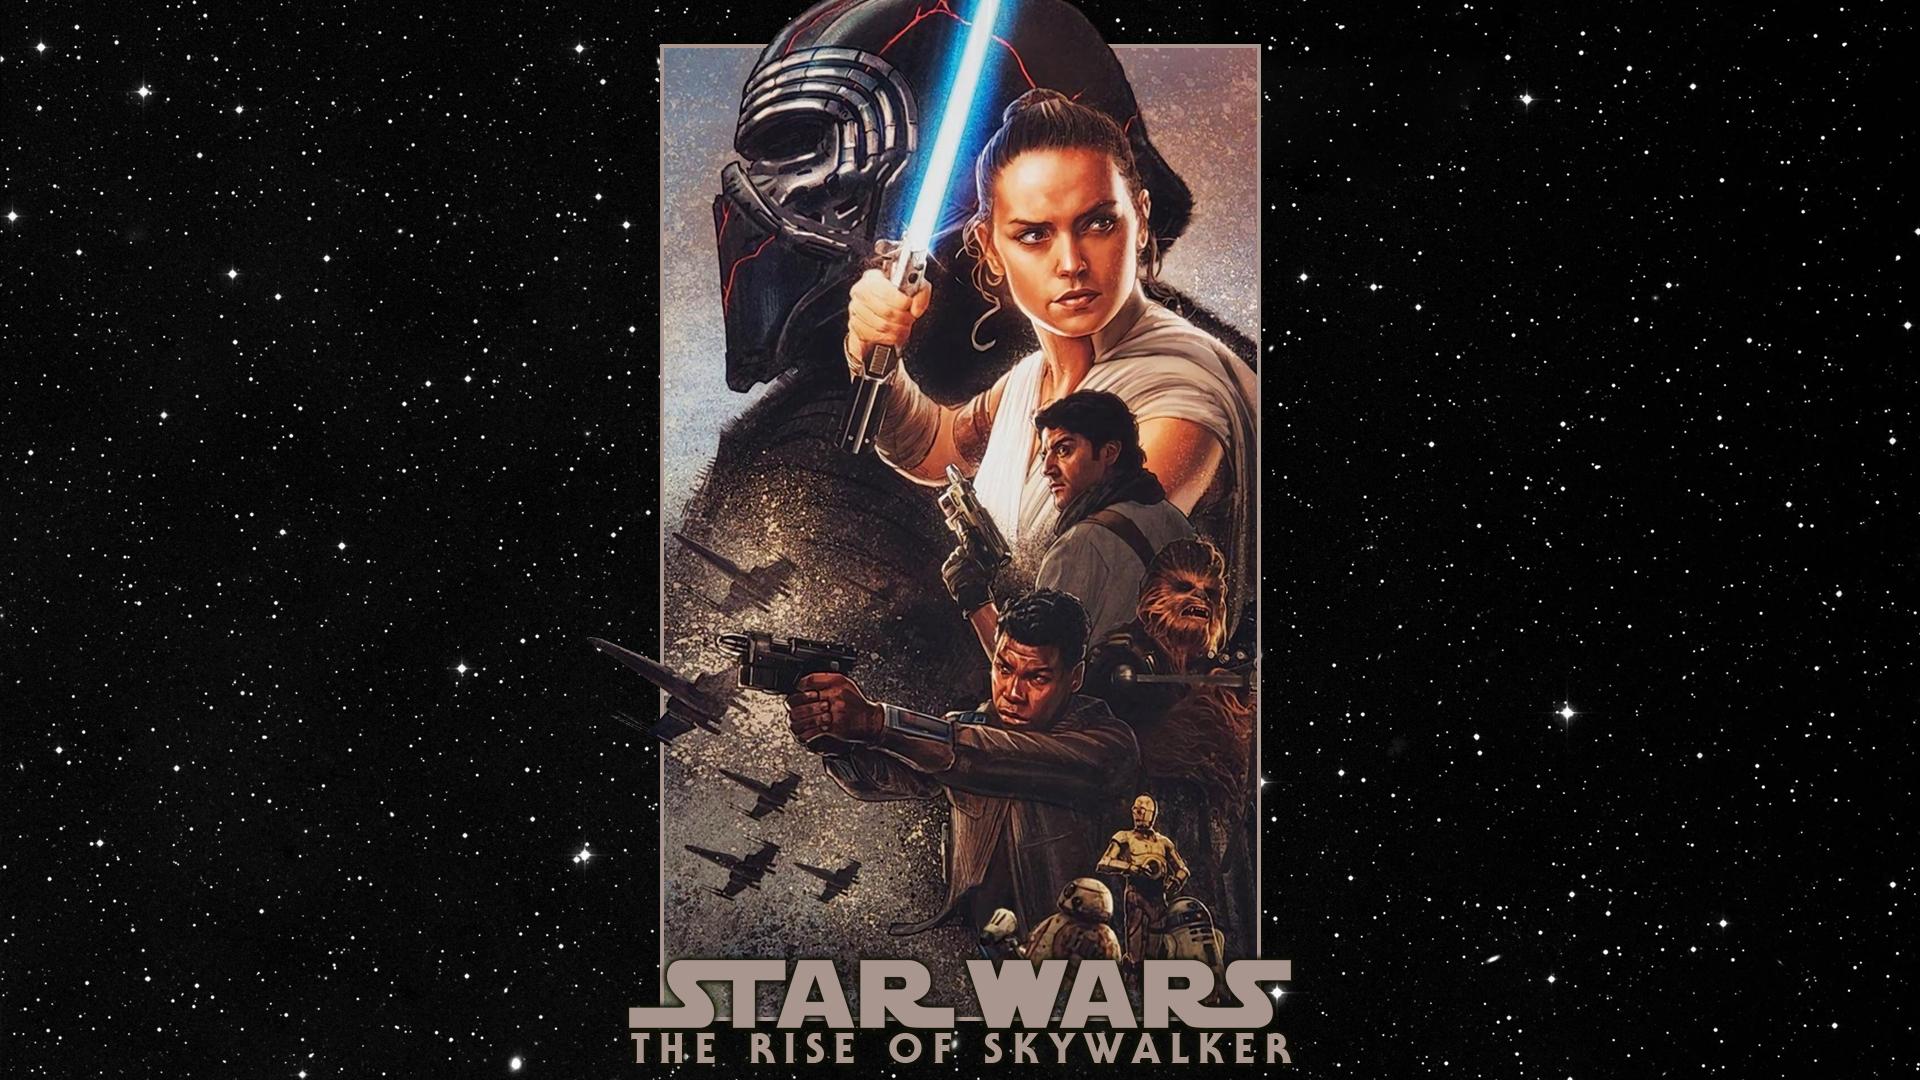 The Rise Of Skywalker Mural Wallpaper By Spirit Of Adventure On Deviantart